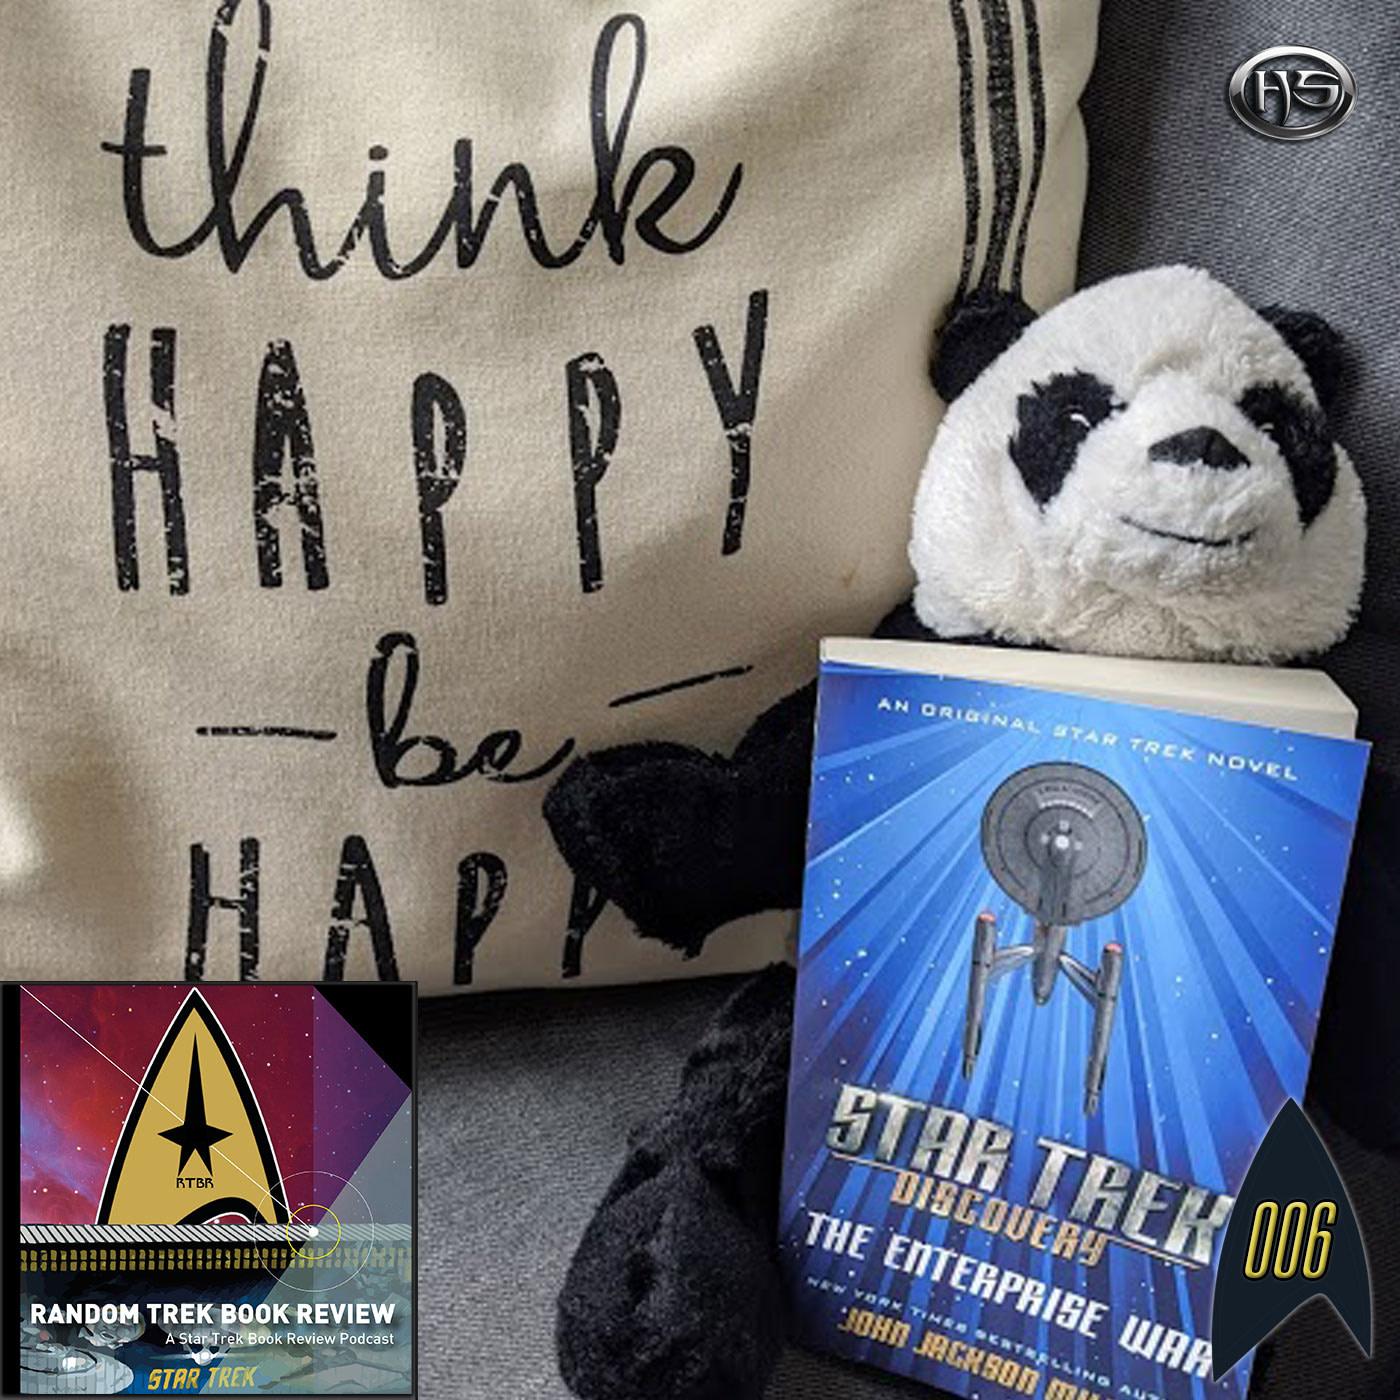 Random Trek Book Review Episode 6